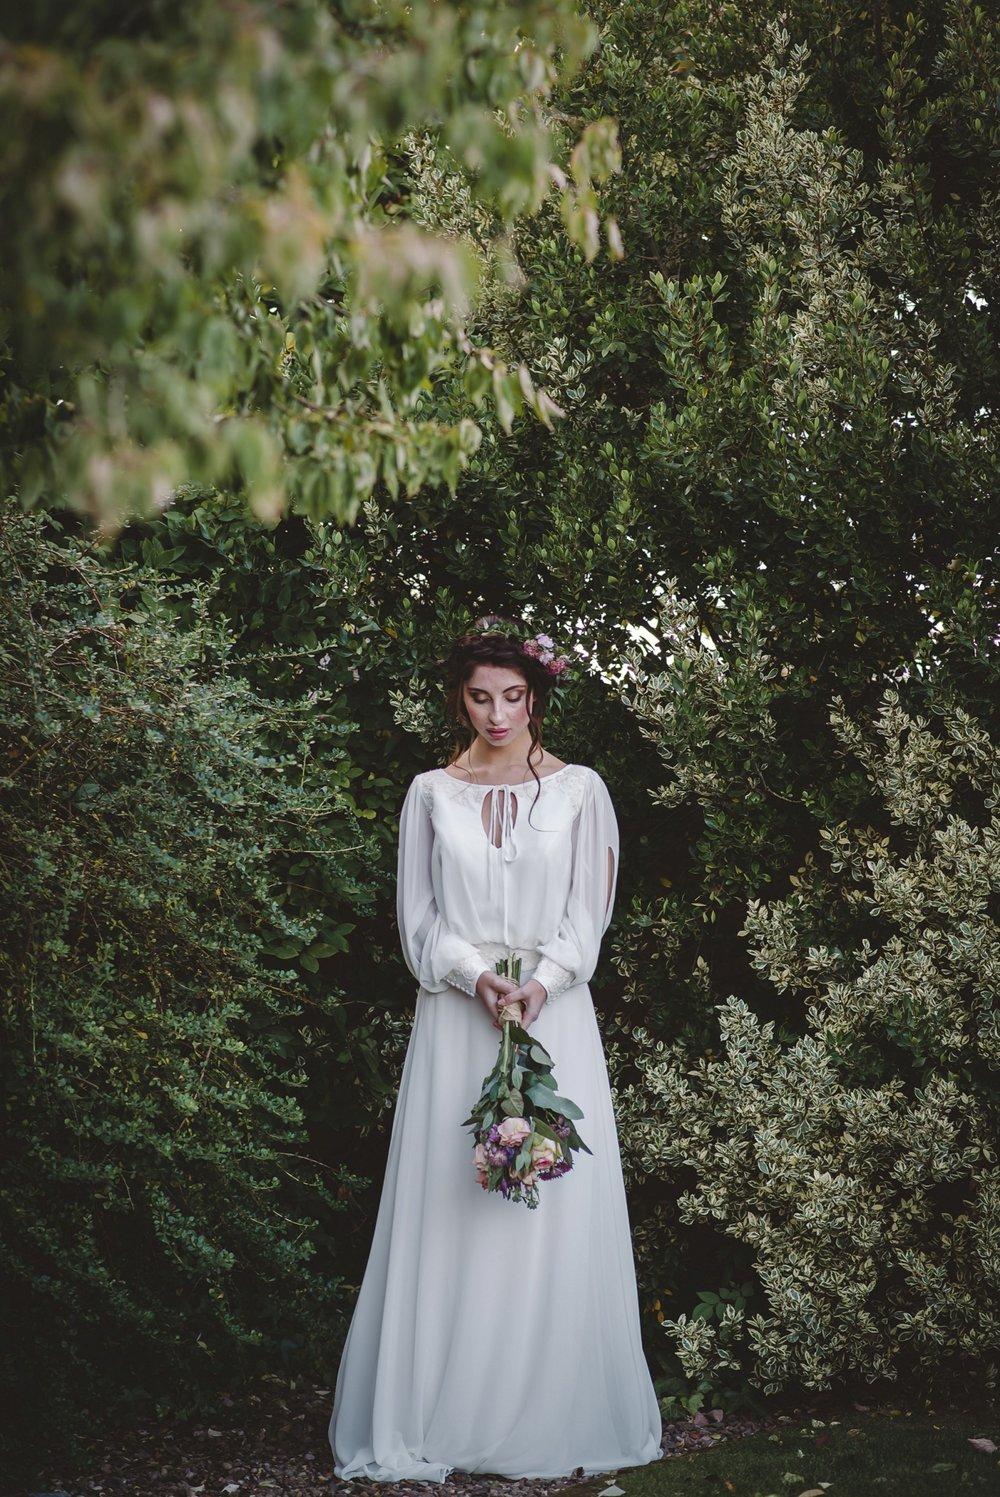 Curradine_bridal_Sept_17_amytiphoto_0071.jpg